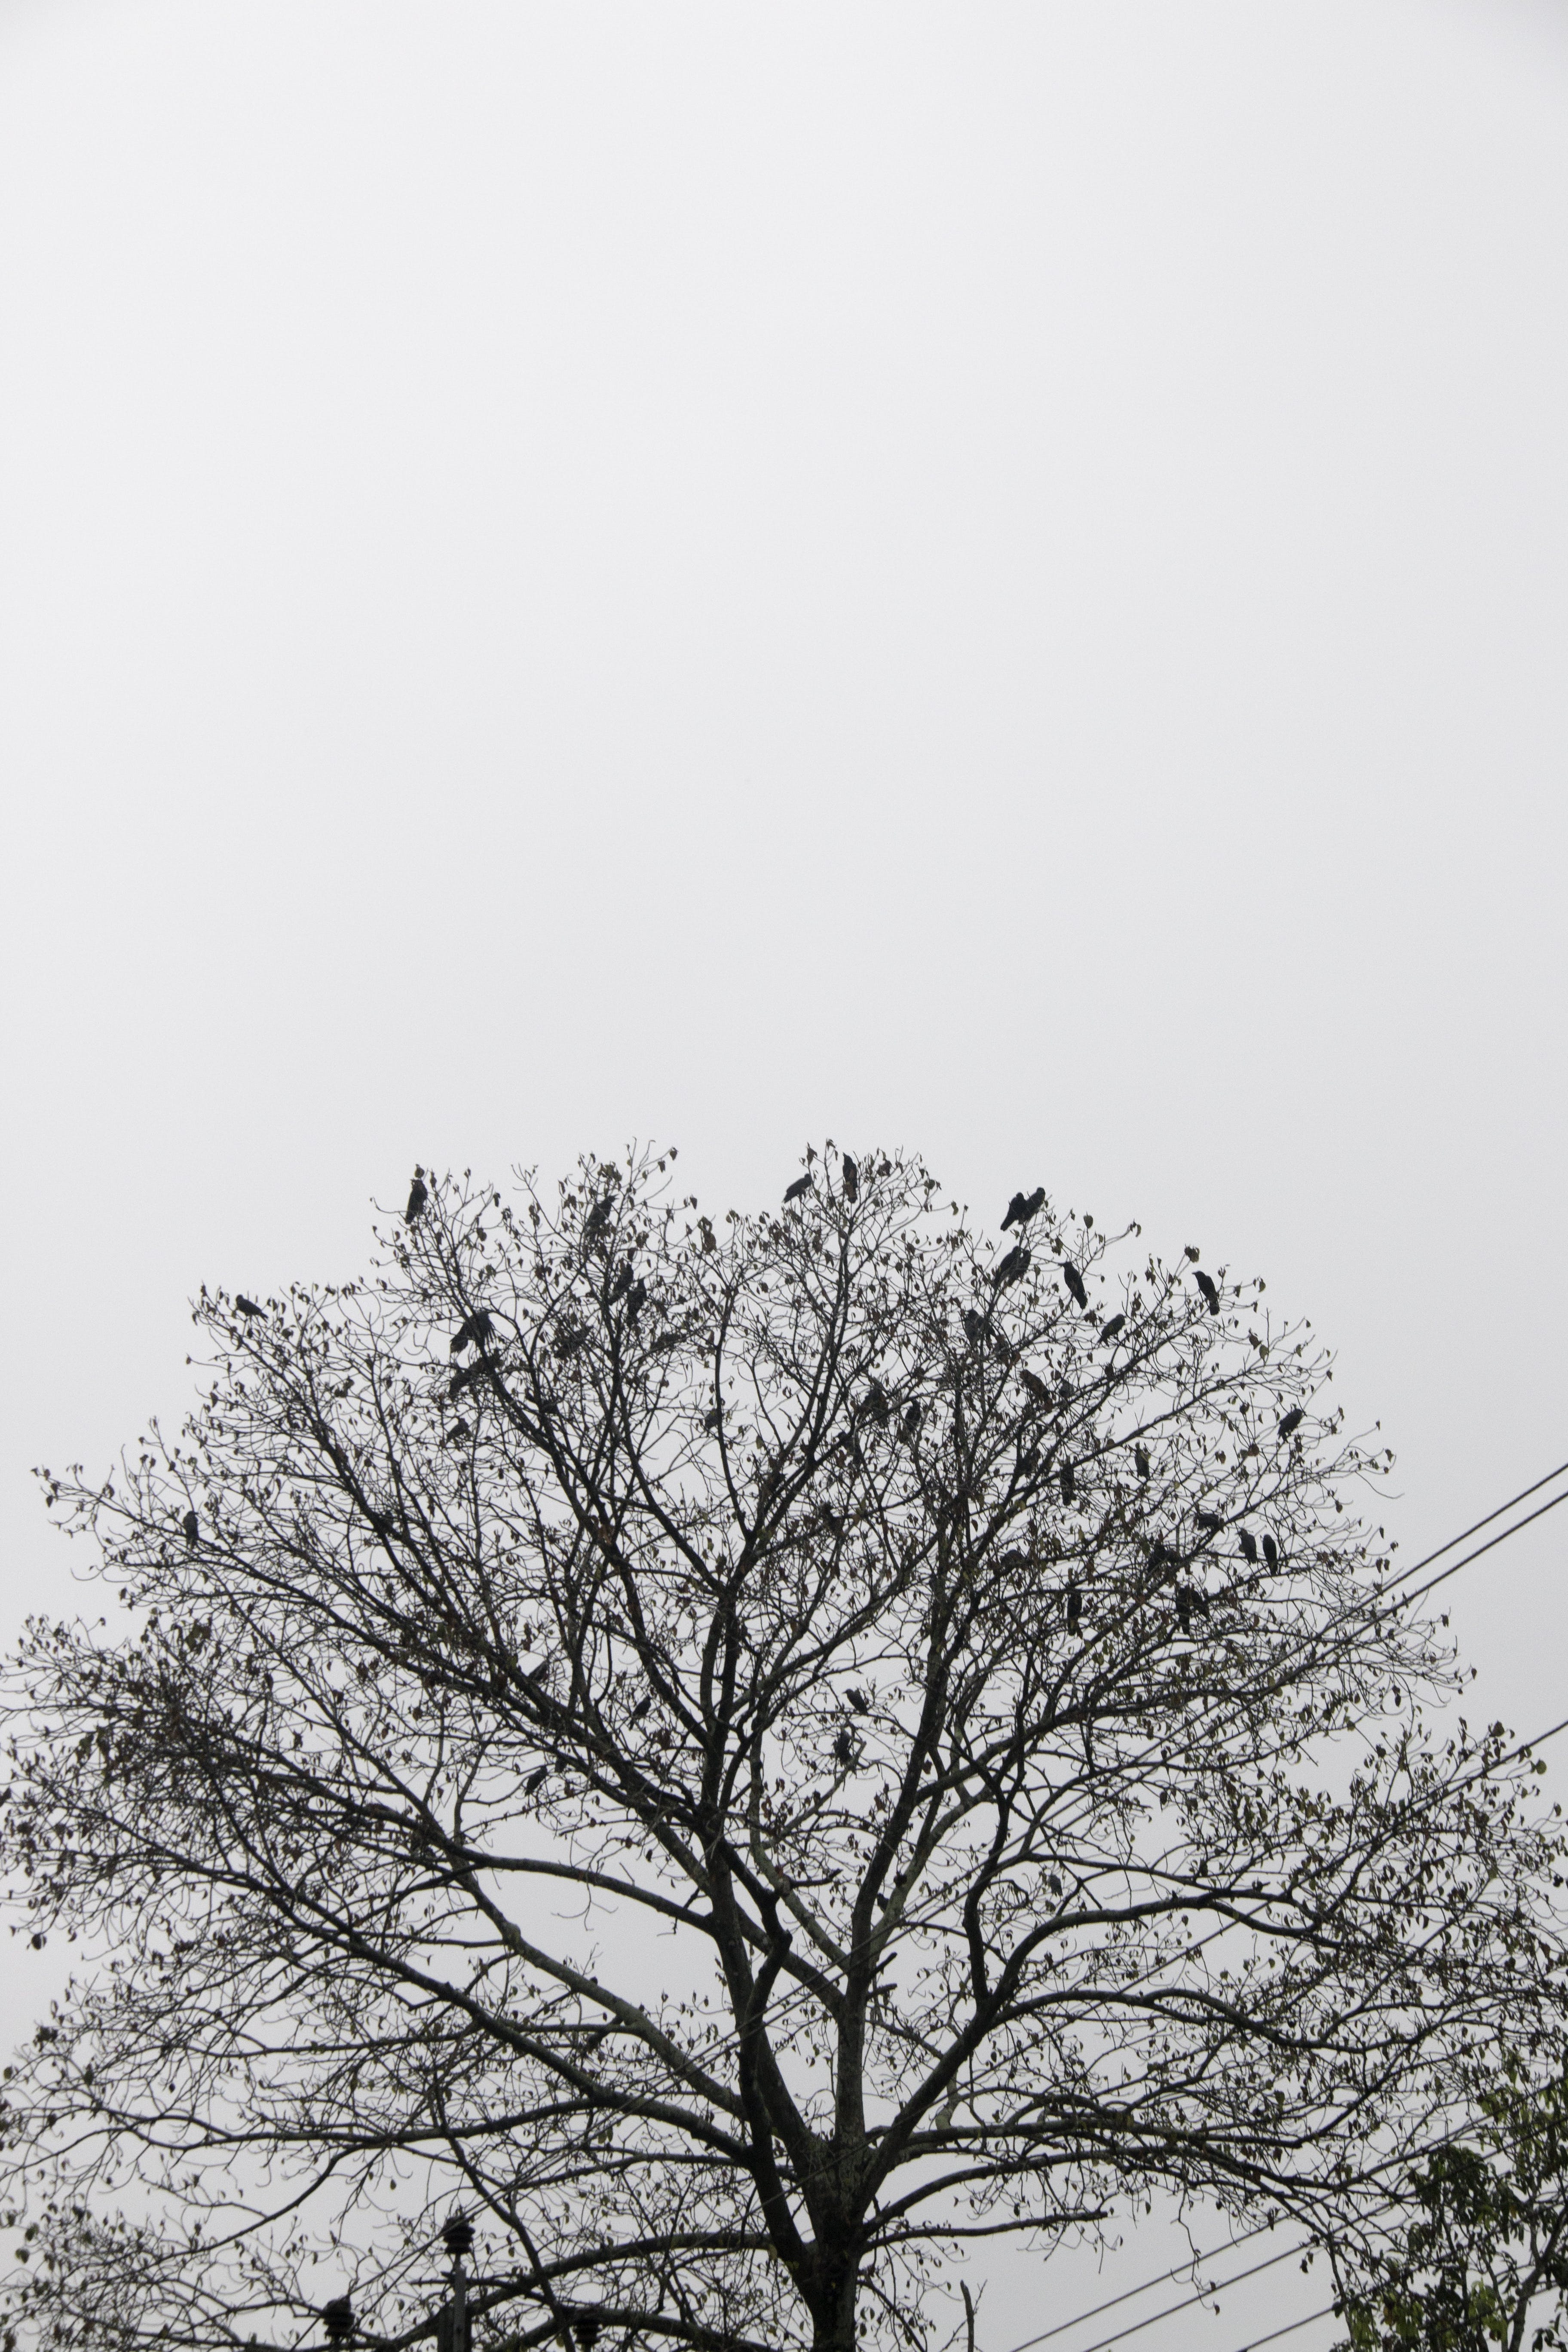 Free stock photo of #Tree, #blackandwhite, #bird